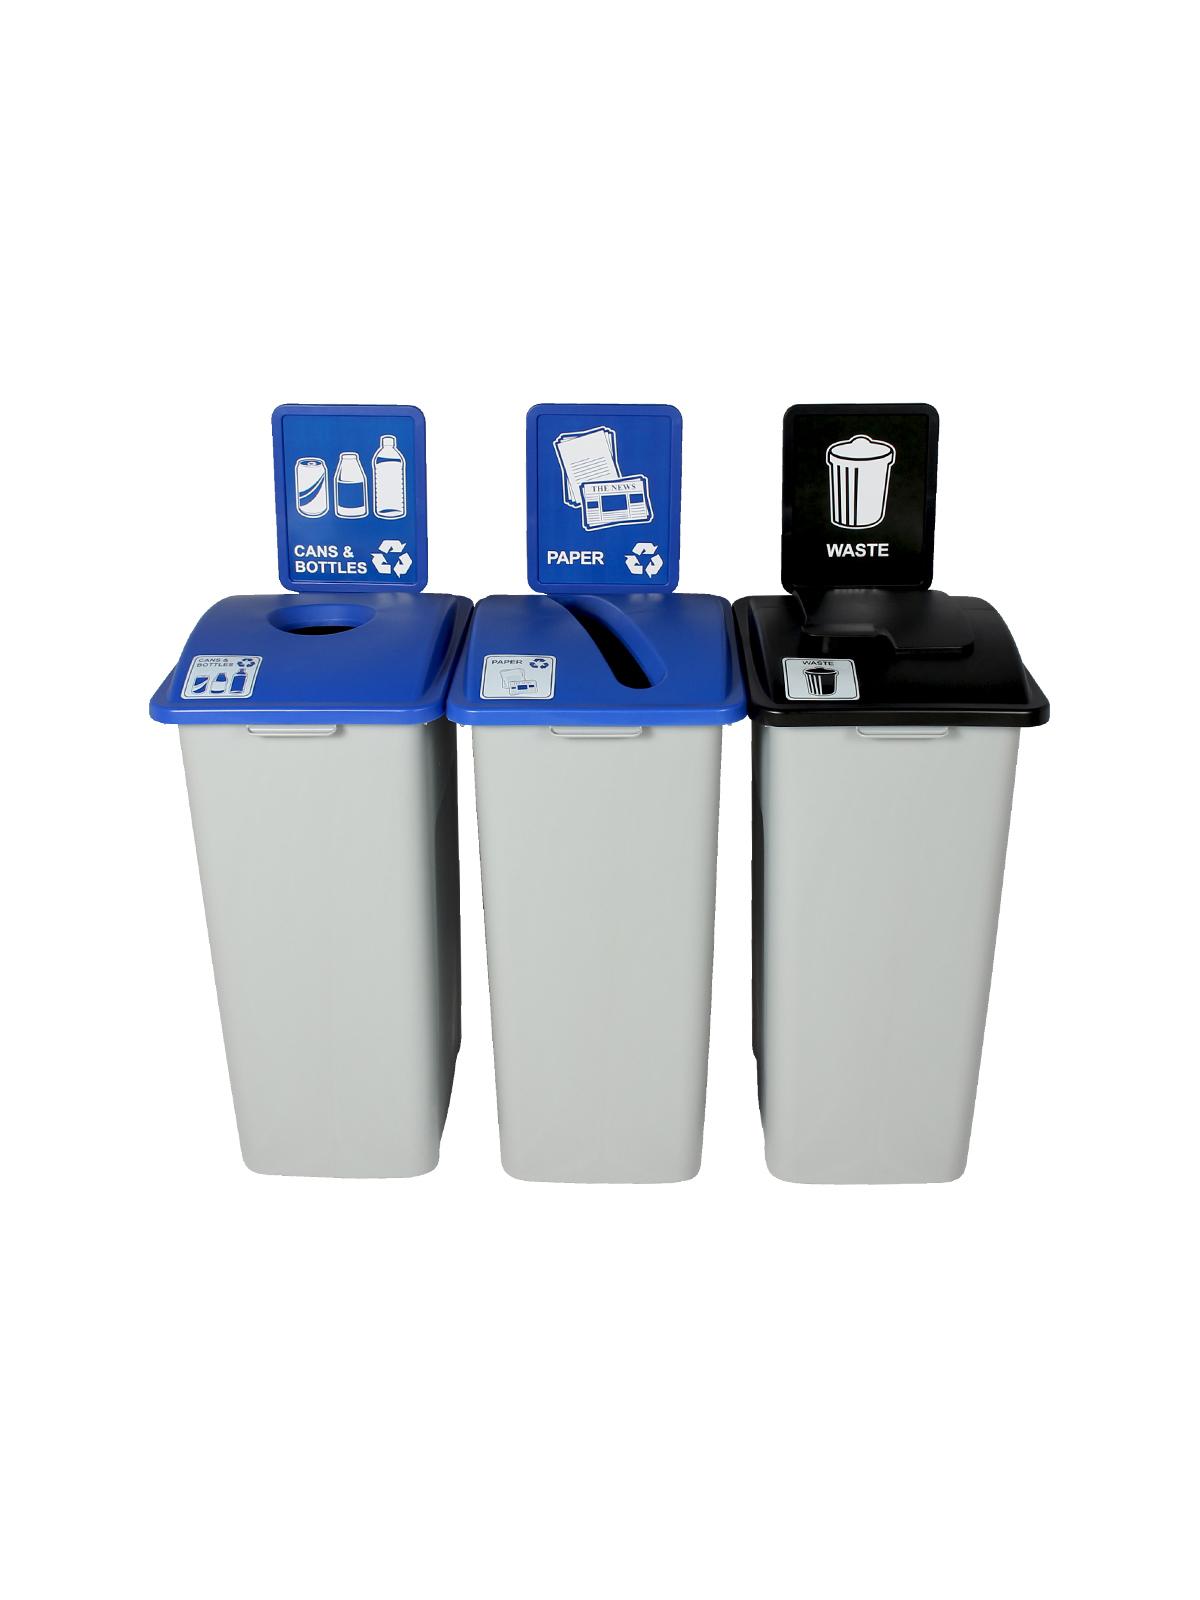 WASTE WATCHER XL - Triple - Cans & Bottles-Paper-Waste - Circle-Slot-Solid Lift - Grey-Blue-Blue-Black